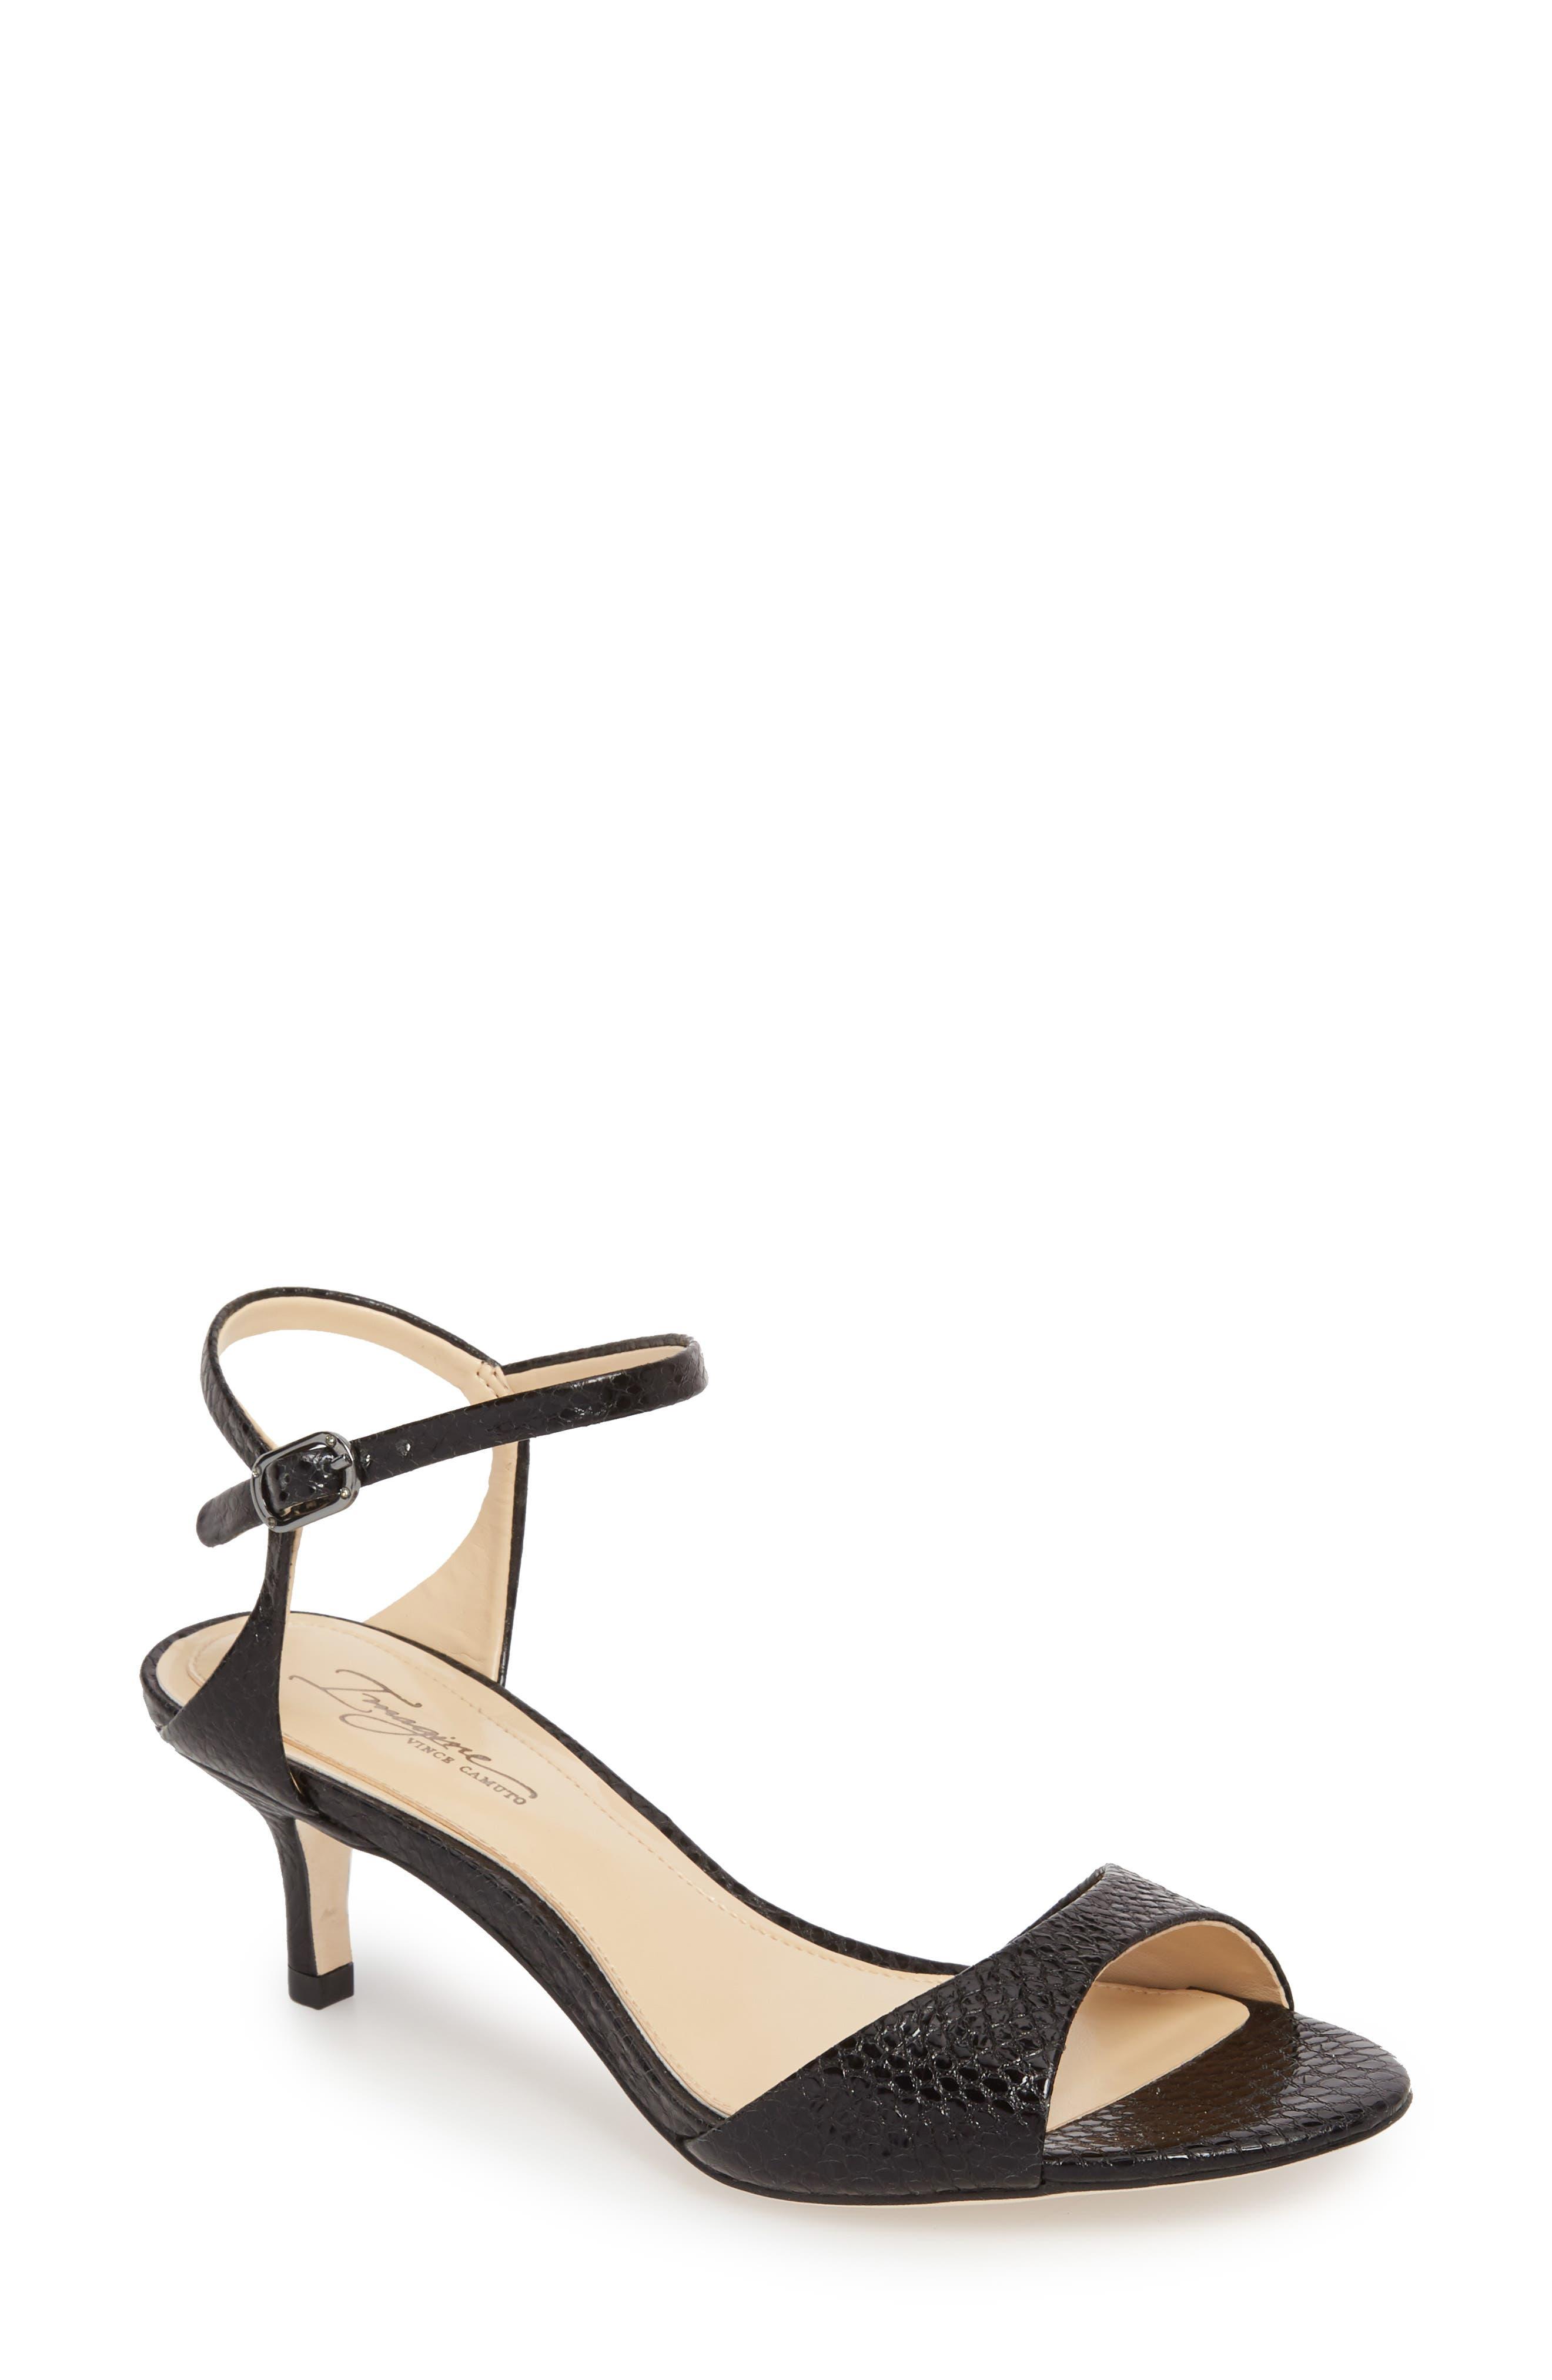 Kymberly Sandal,                         Main,                         color, BLACK LEATHER